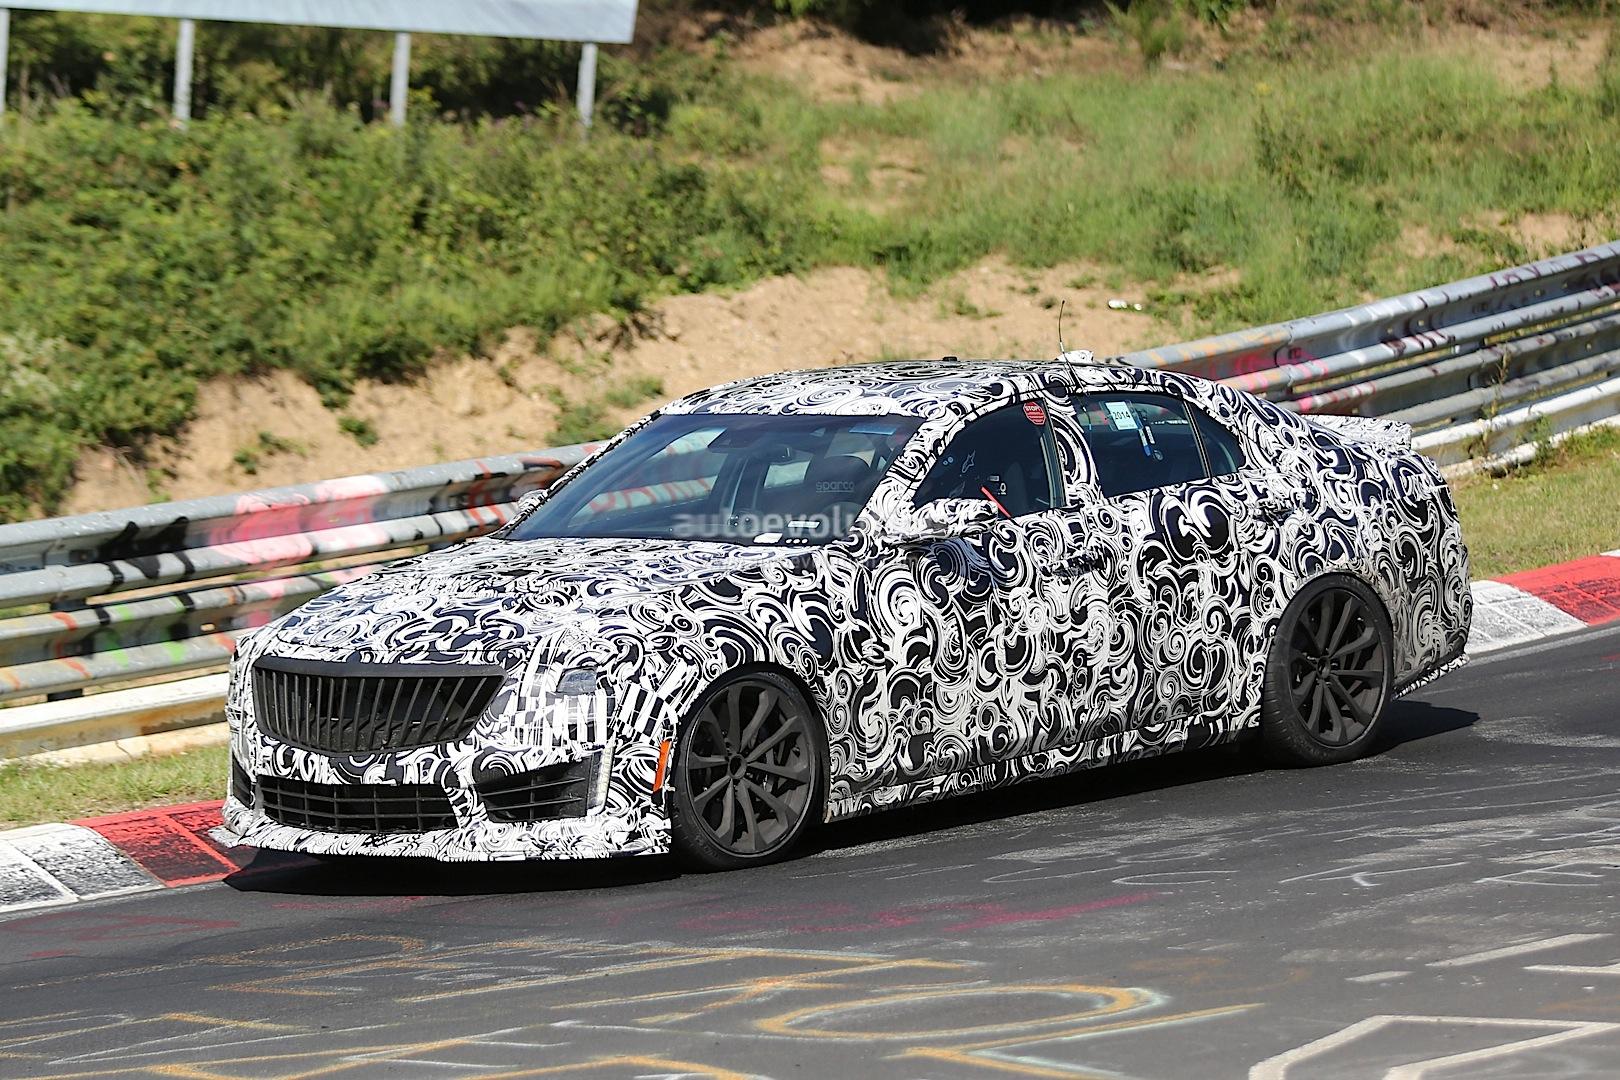 Supercharged+V8+Engine 2016 Cadillac CTS-V to Get Supercharged V8